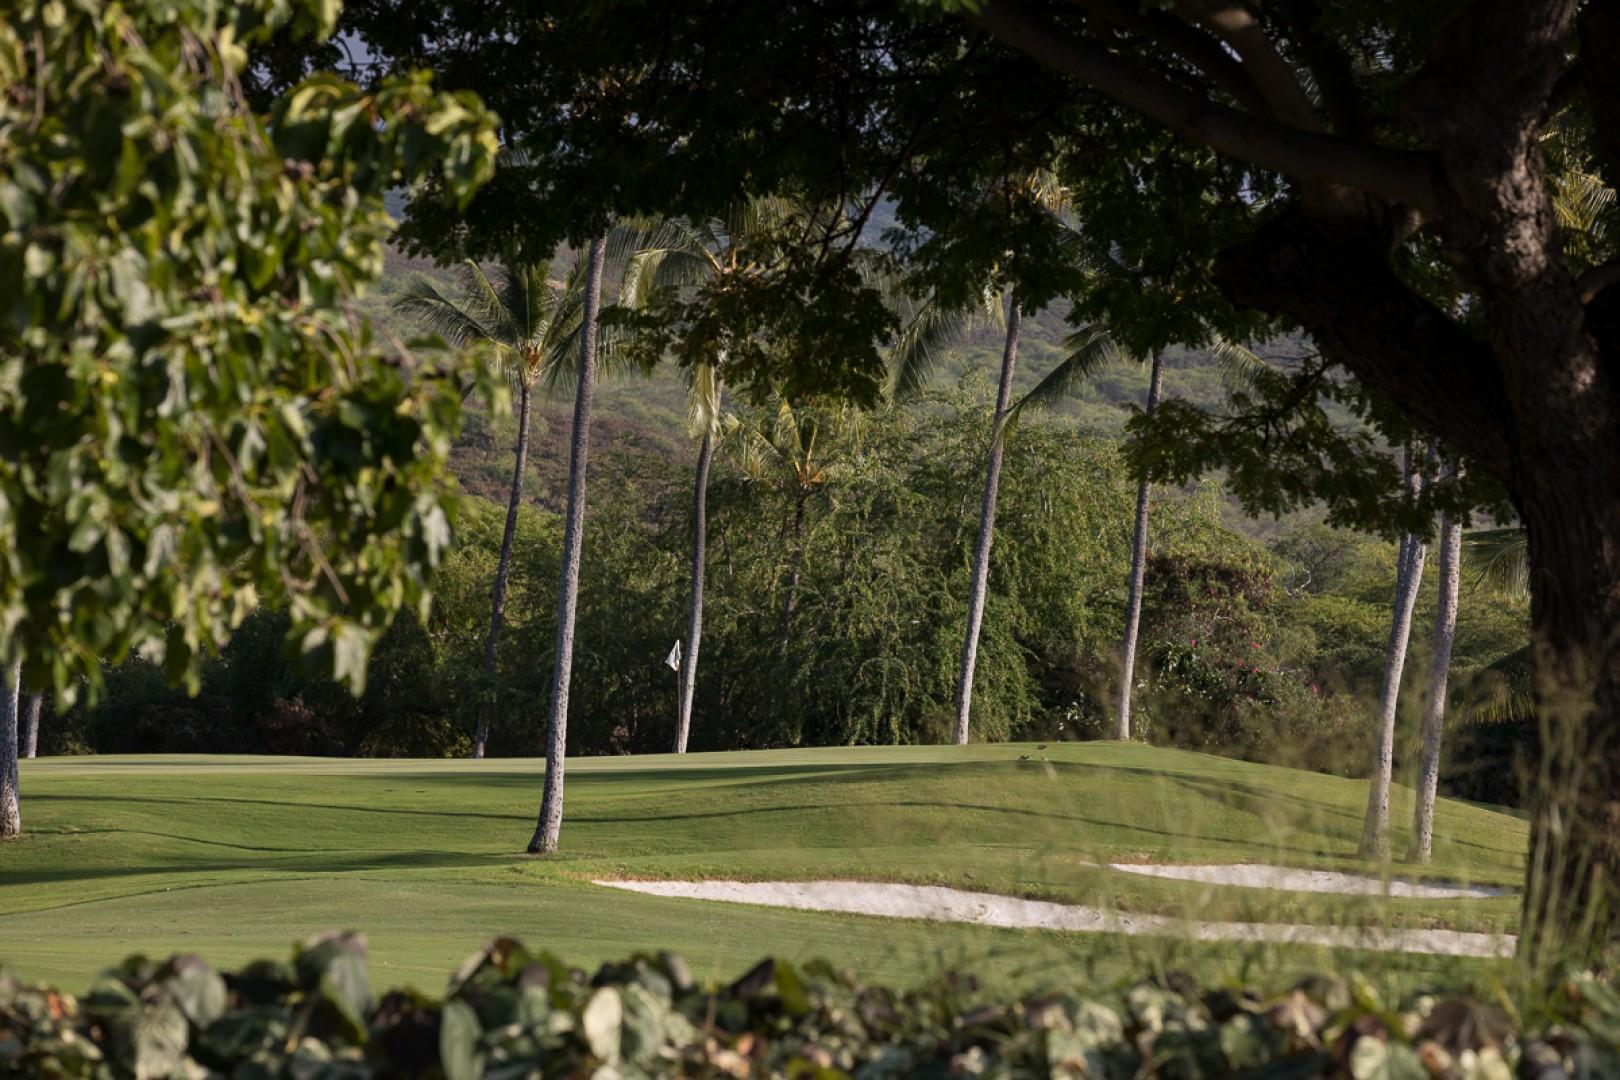 The lush golf course